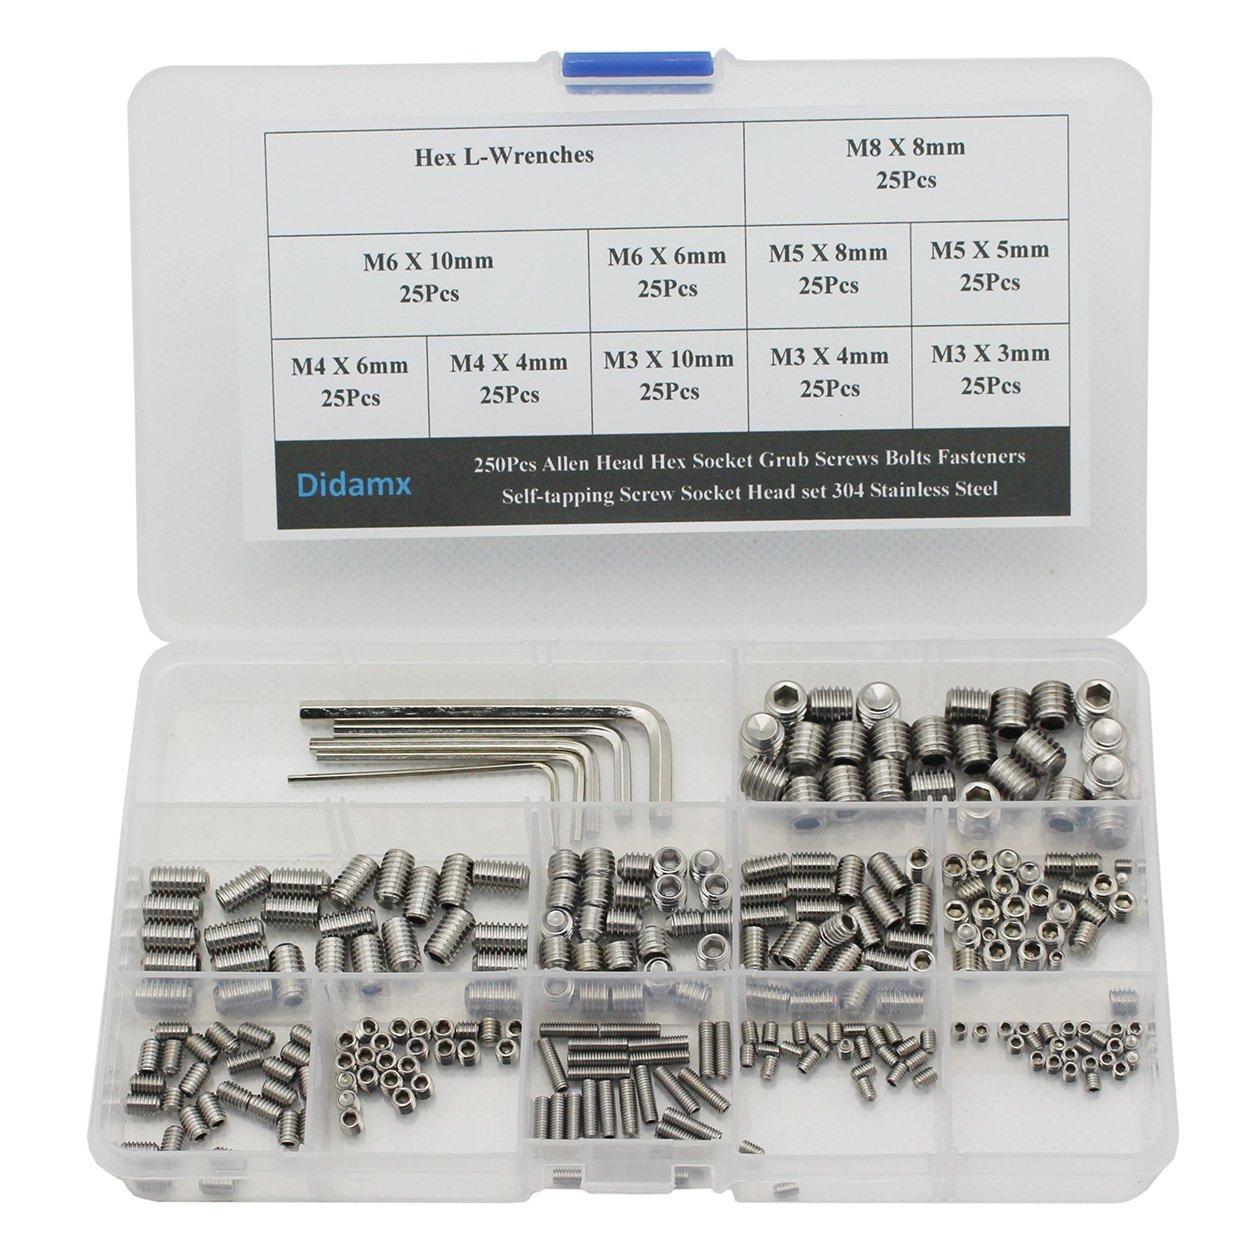 Stainless Steel Self-Tapping Grub Screws Assortment Kit Set Hex Socket Screw